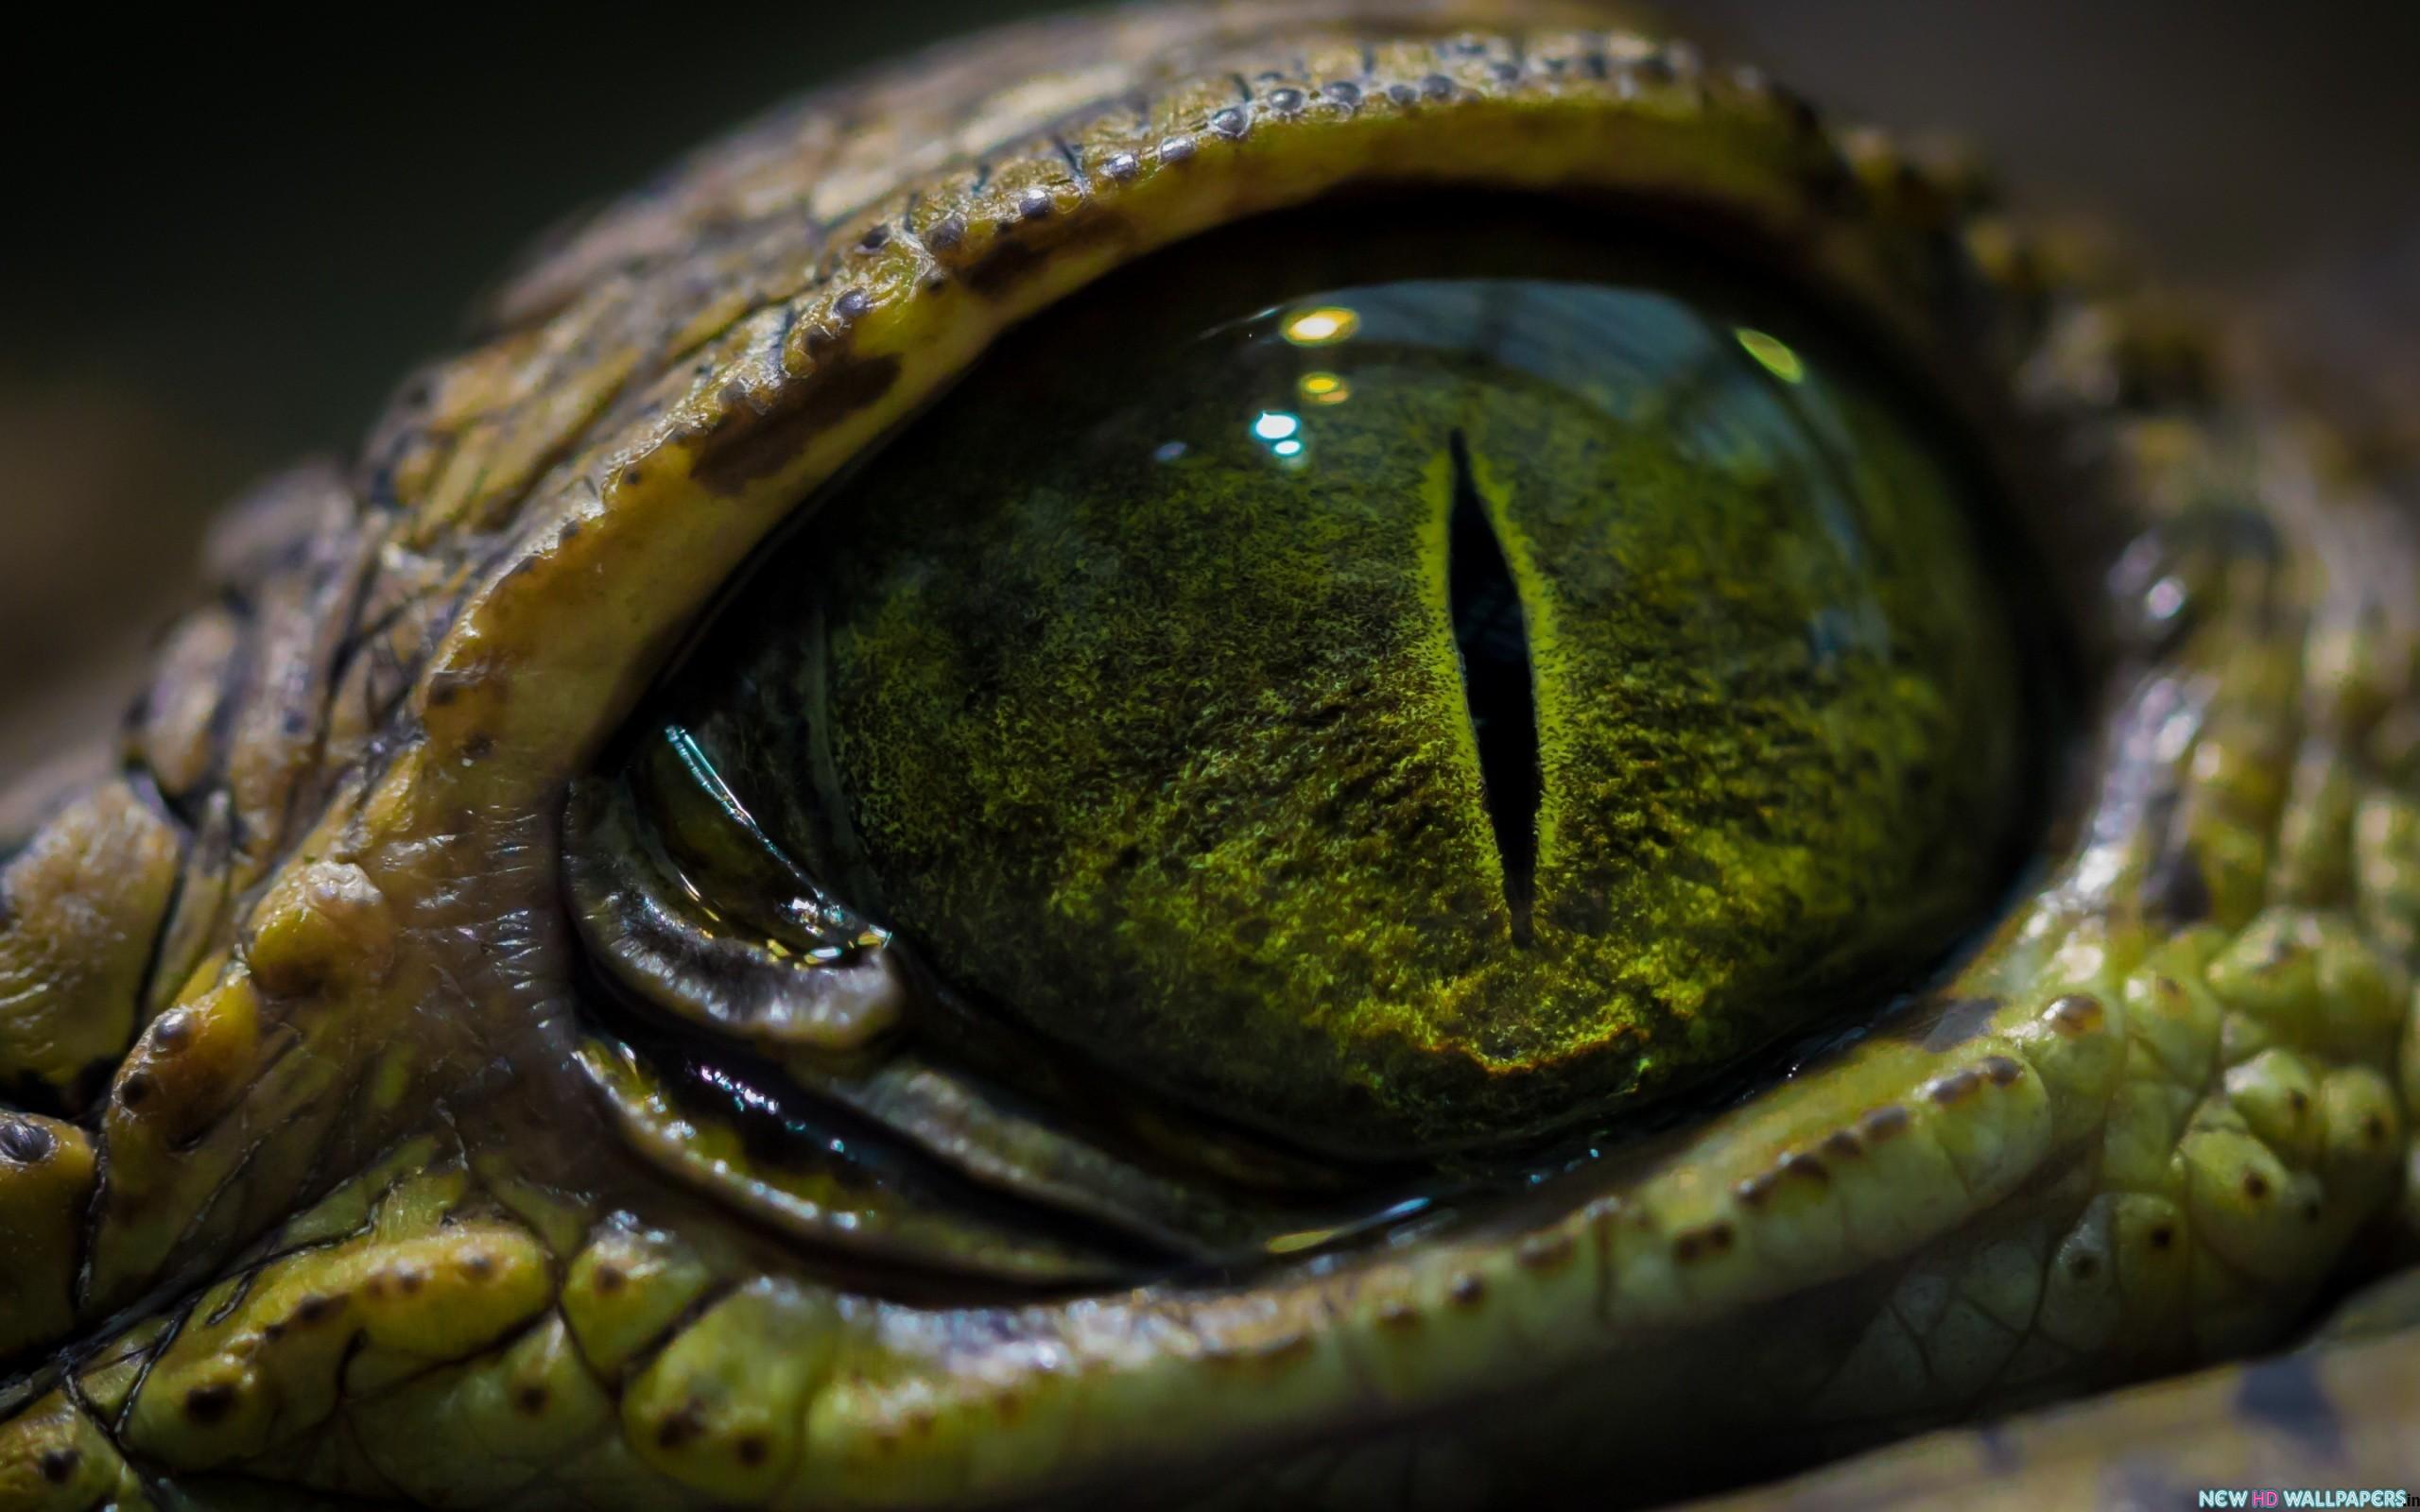 Snake Eyes Wallpaper hd Snake Eye Animal hd Wallpaper 2560x1600